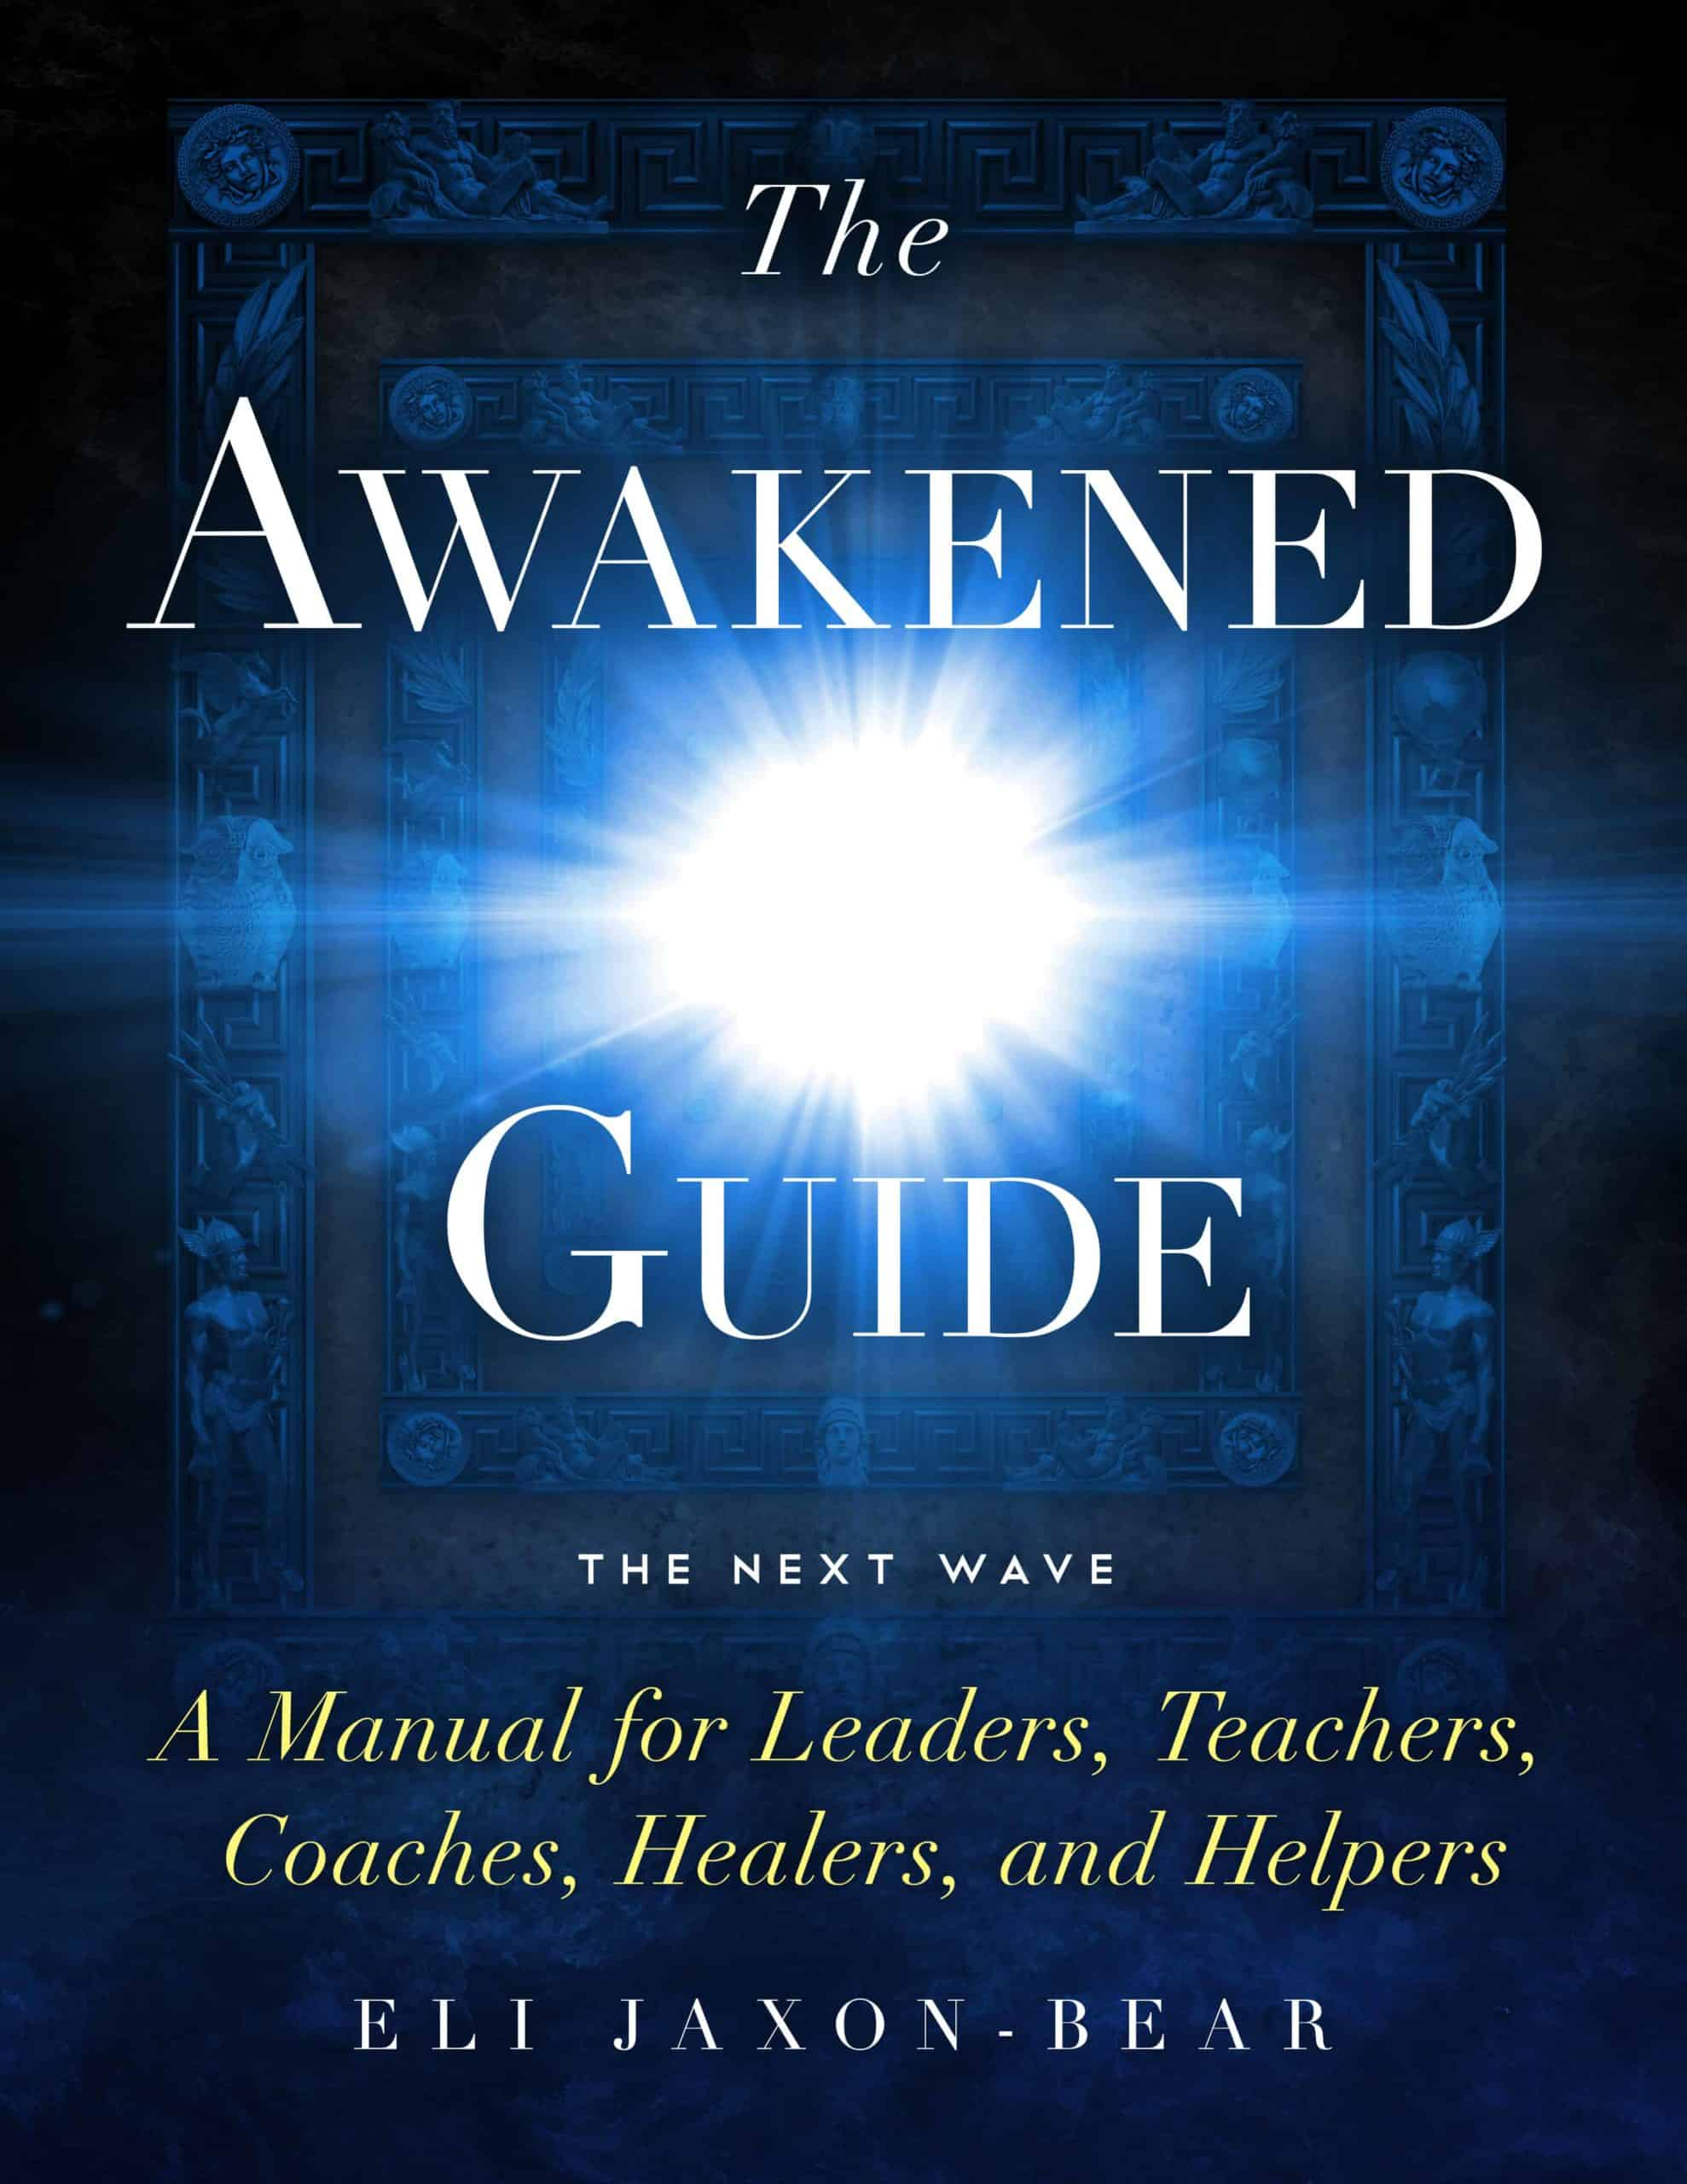 The Awakened Guide